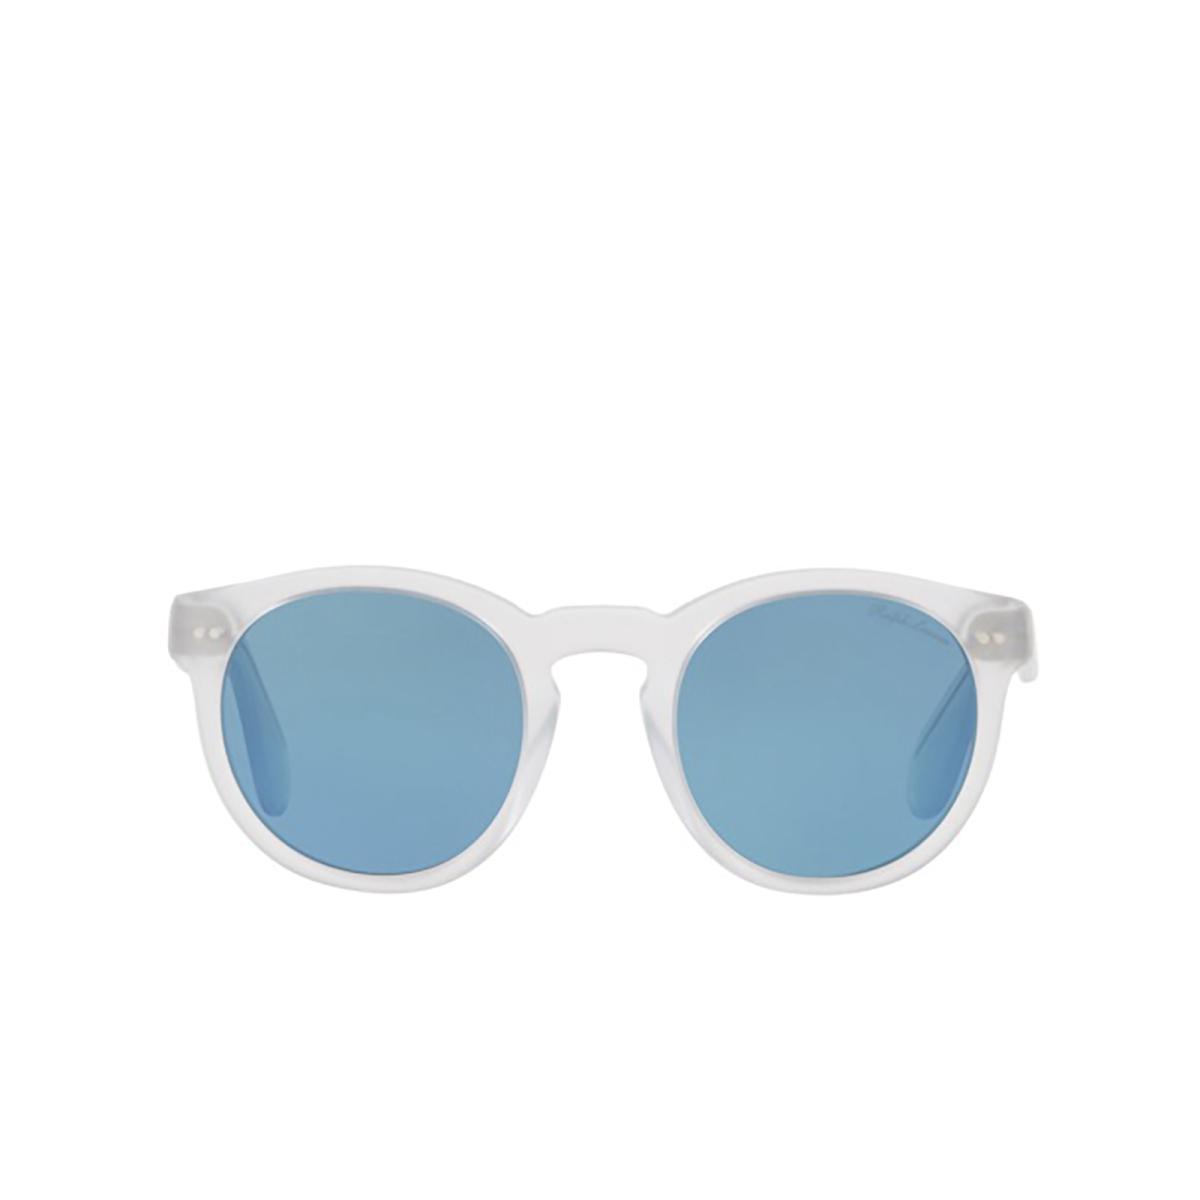 Ralph Lauren® Round Sunglasses: RL8146P color Sandbalst Crystal 500256 - front view.